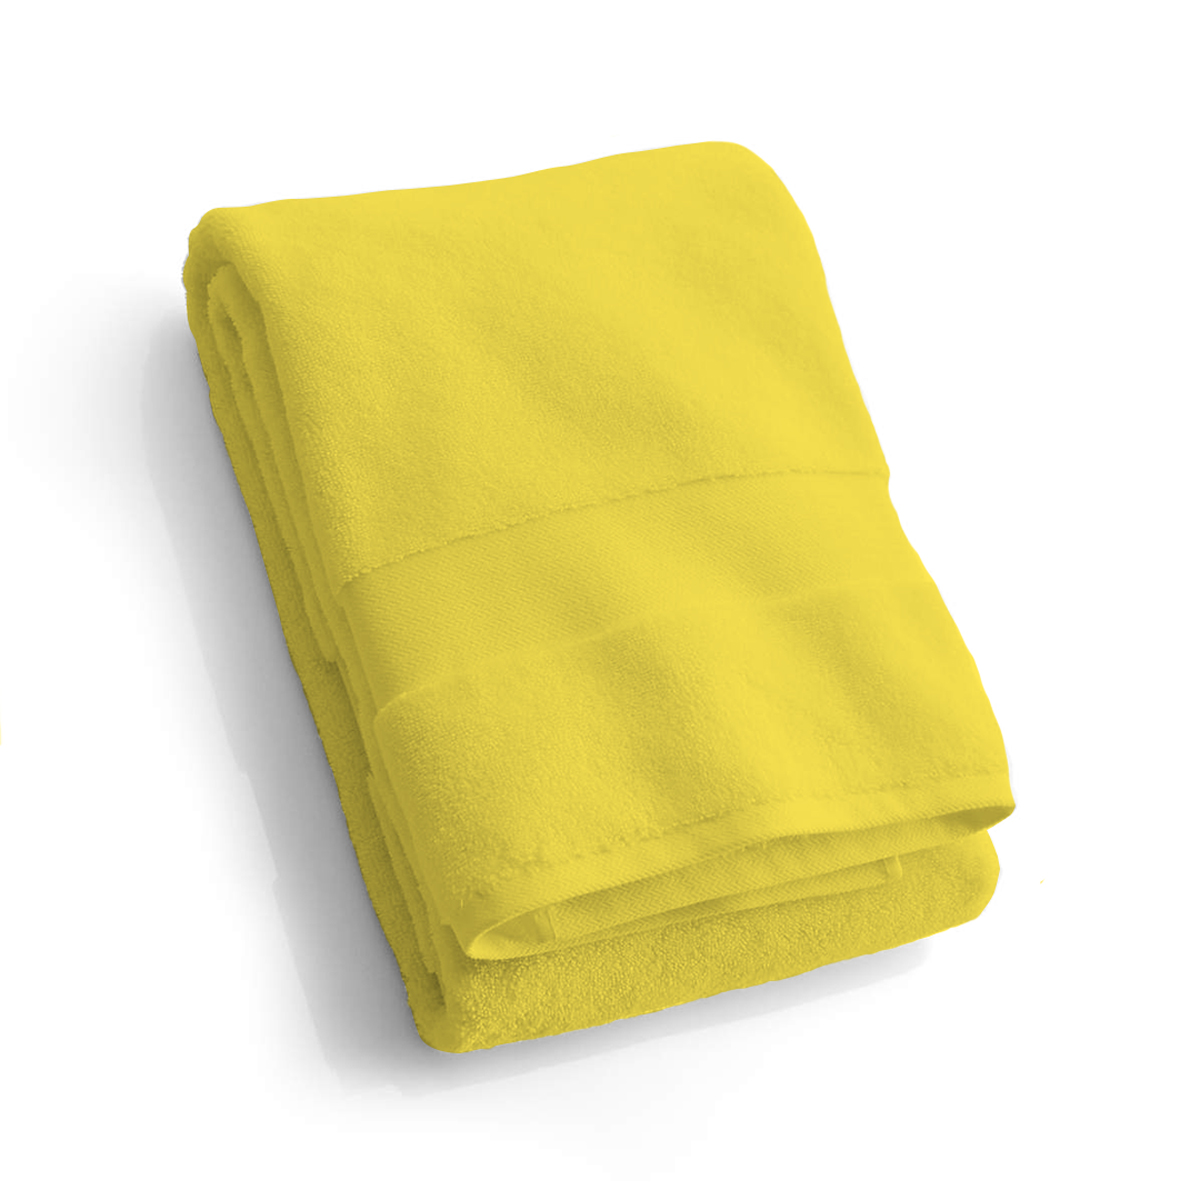 Brisača, rumena